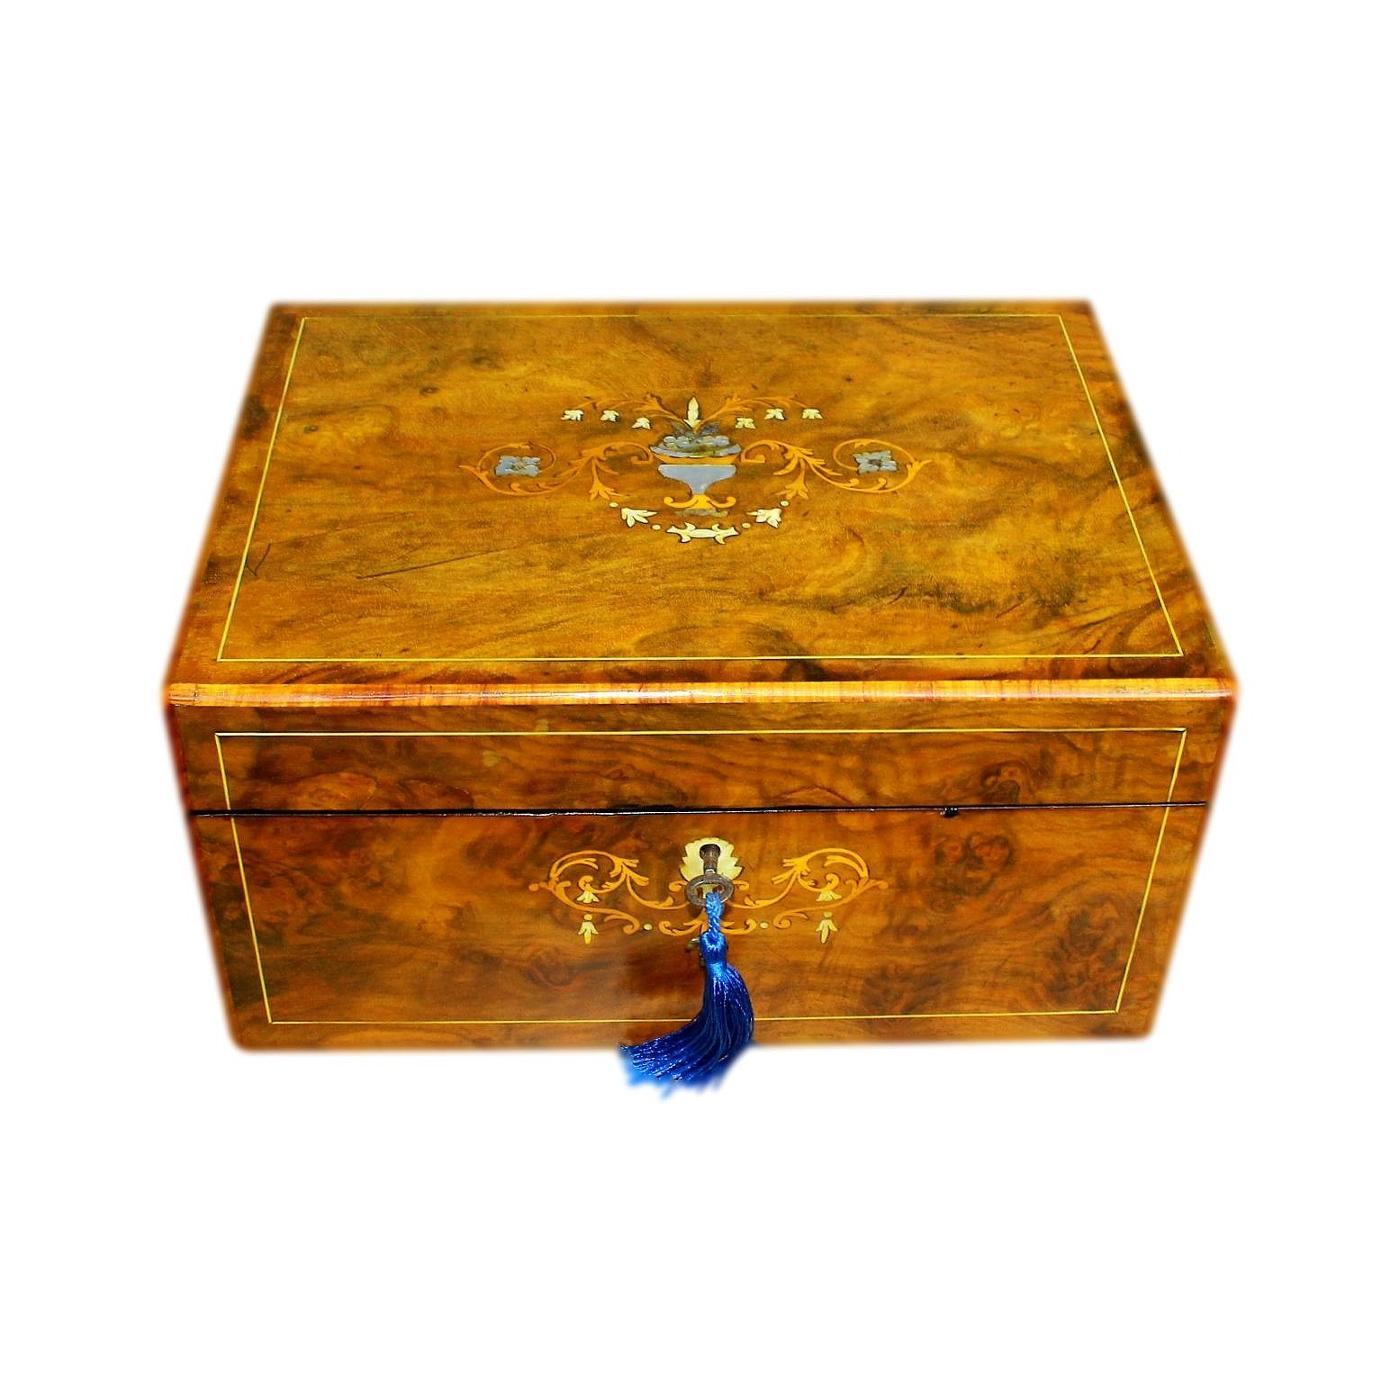 Beautifully Refurbished Antique Inlaid Walnut Jewellery Box